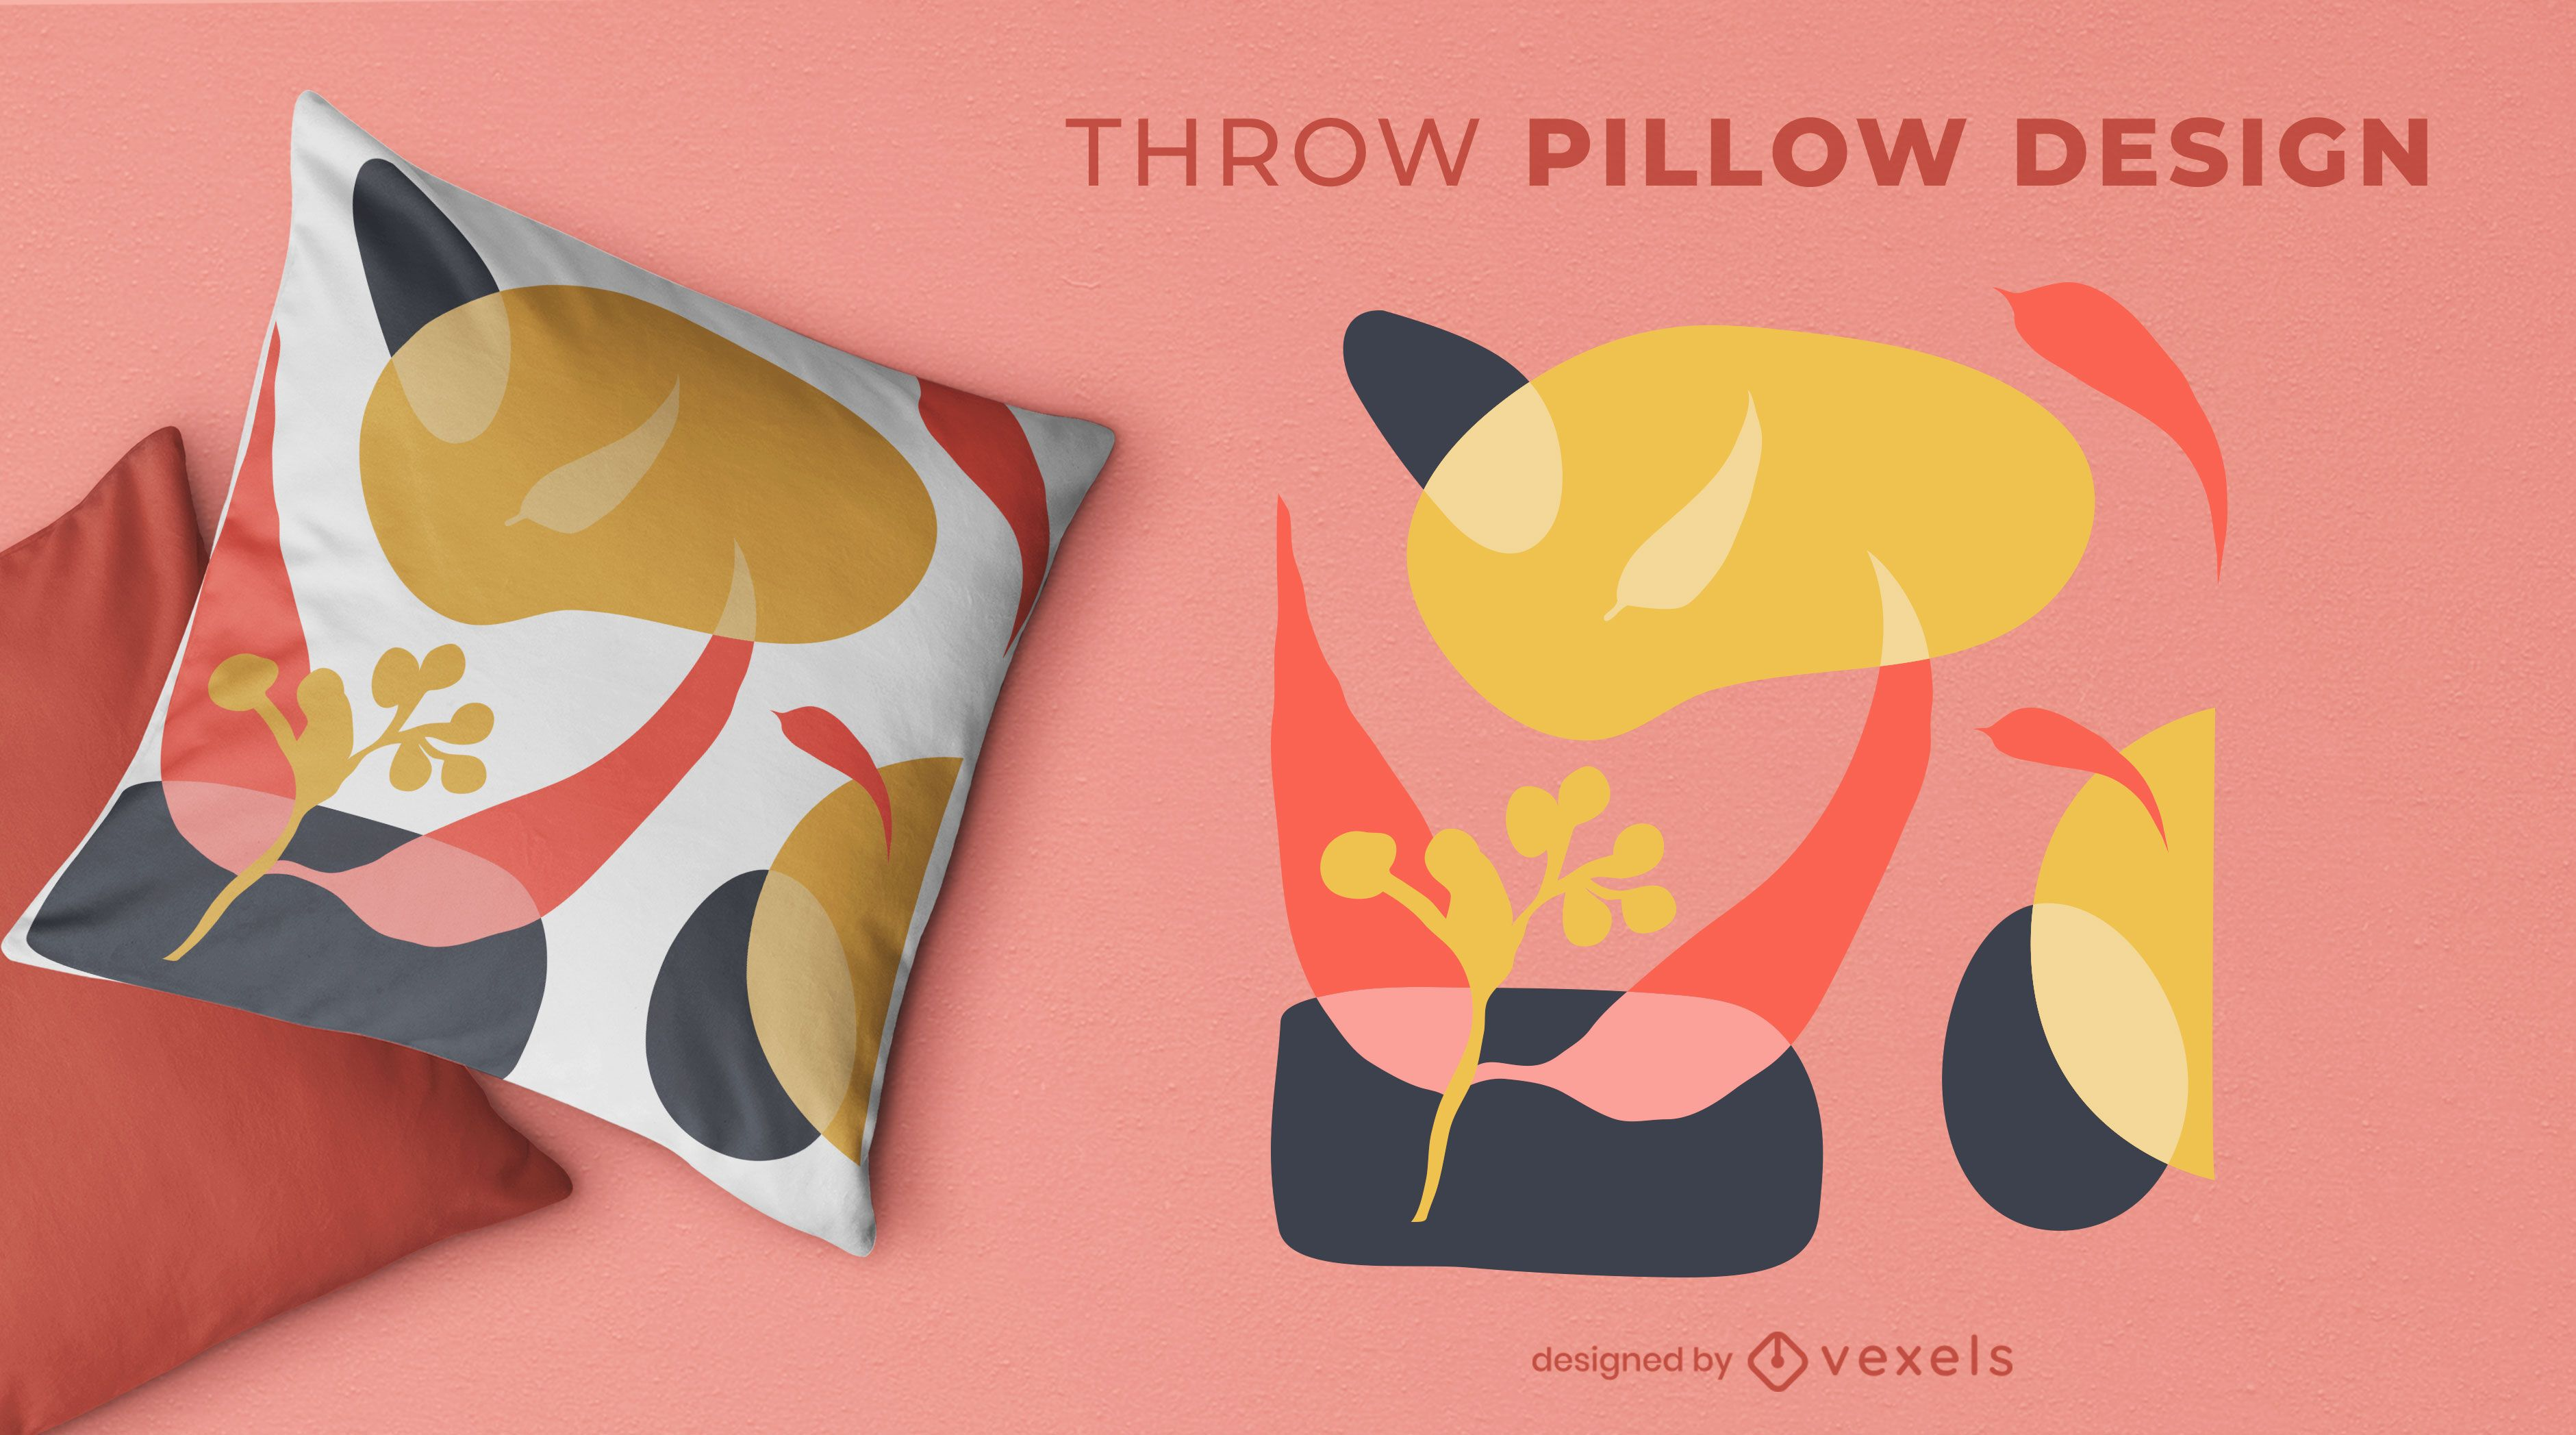 Abstract organic throw pillow design